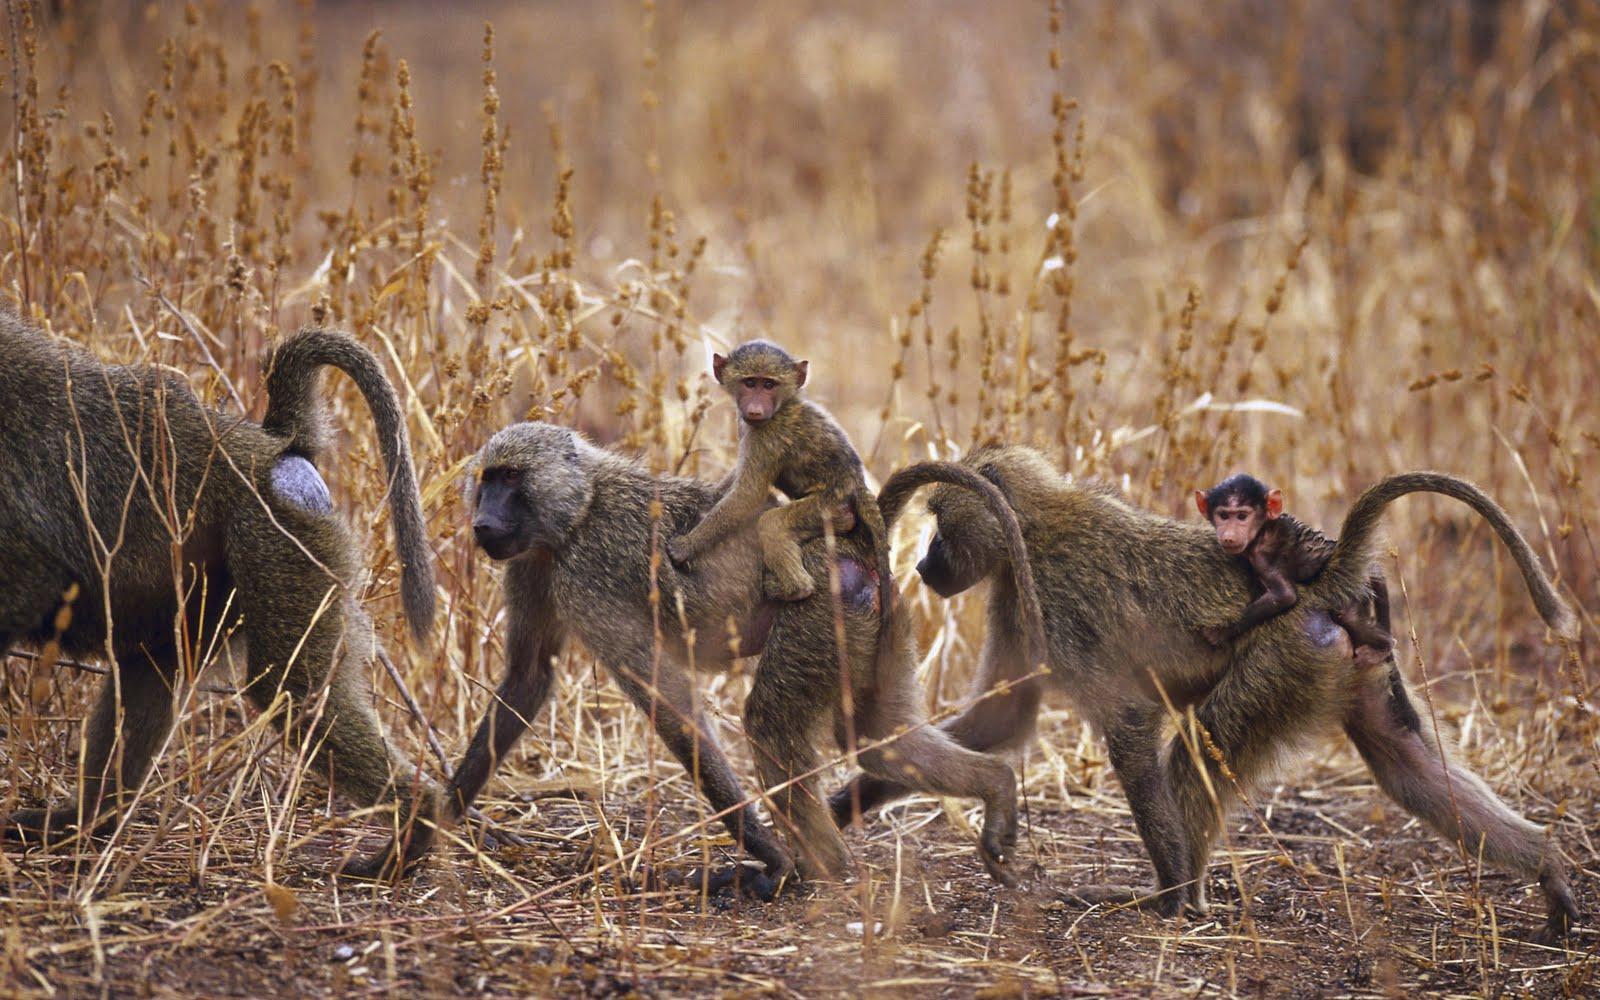 http://1.bp.blogspot.com/-MDj4H2uE2rc/ThFeCey9kfI/AAAAAAAABgQ/H2ZyVEqo4GY/s1600/Wallcate.com+-+Amazing+Wild+Africa+Wallpaper+%252830%2529.jpg